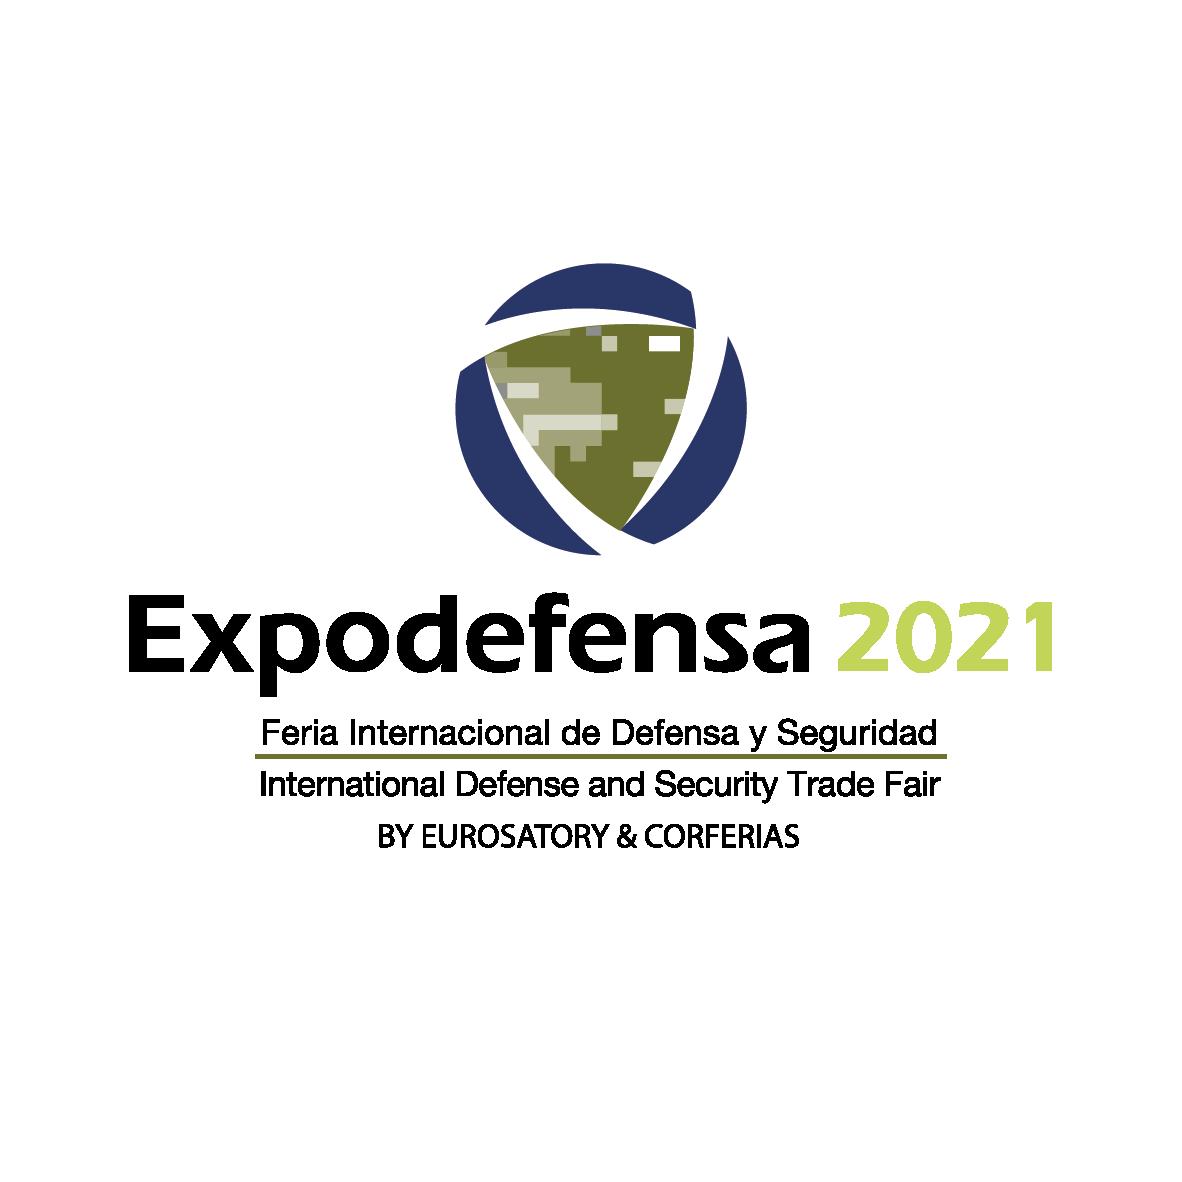 LAS HERRAMIENTAS MULTIMEDIA EXPODEFENSA 2021 - Expodefensa 2021